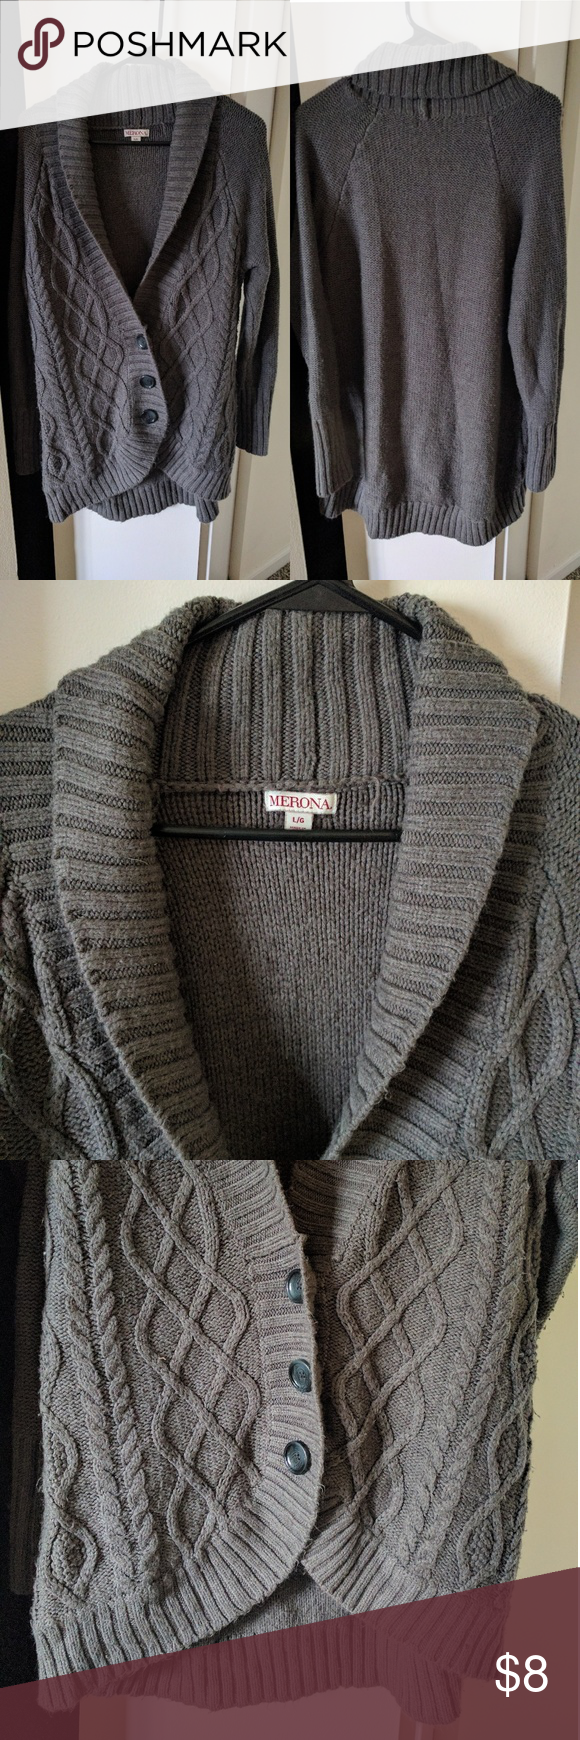 Thick gray Grandpa sweater Super cozy, soft cotton sweater with ...